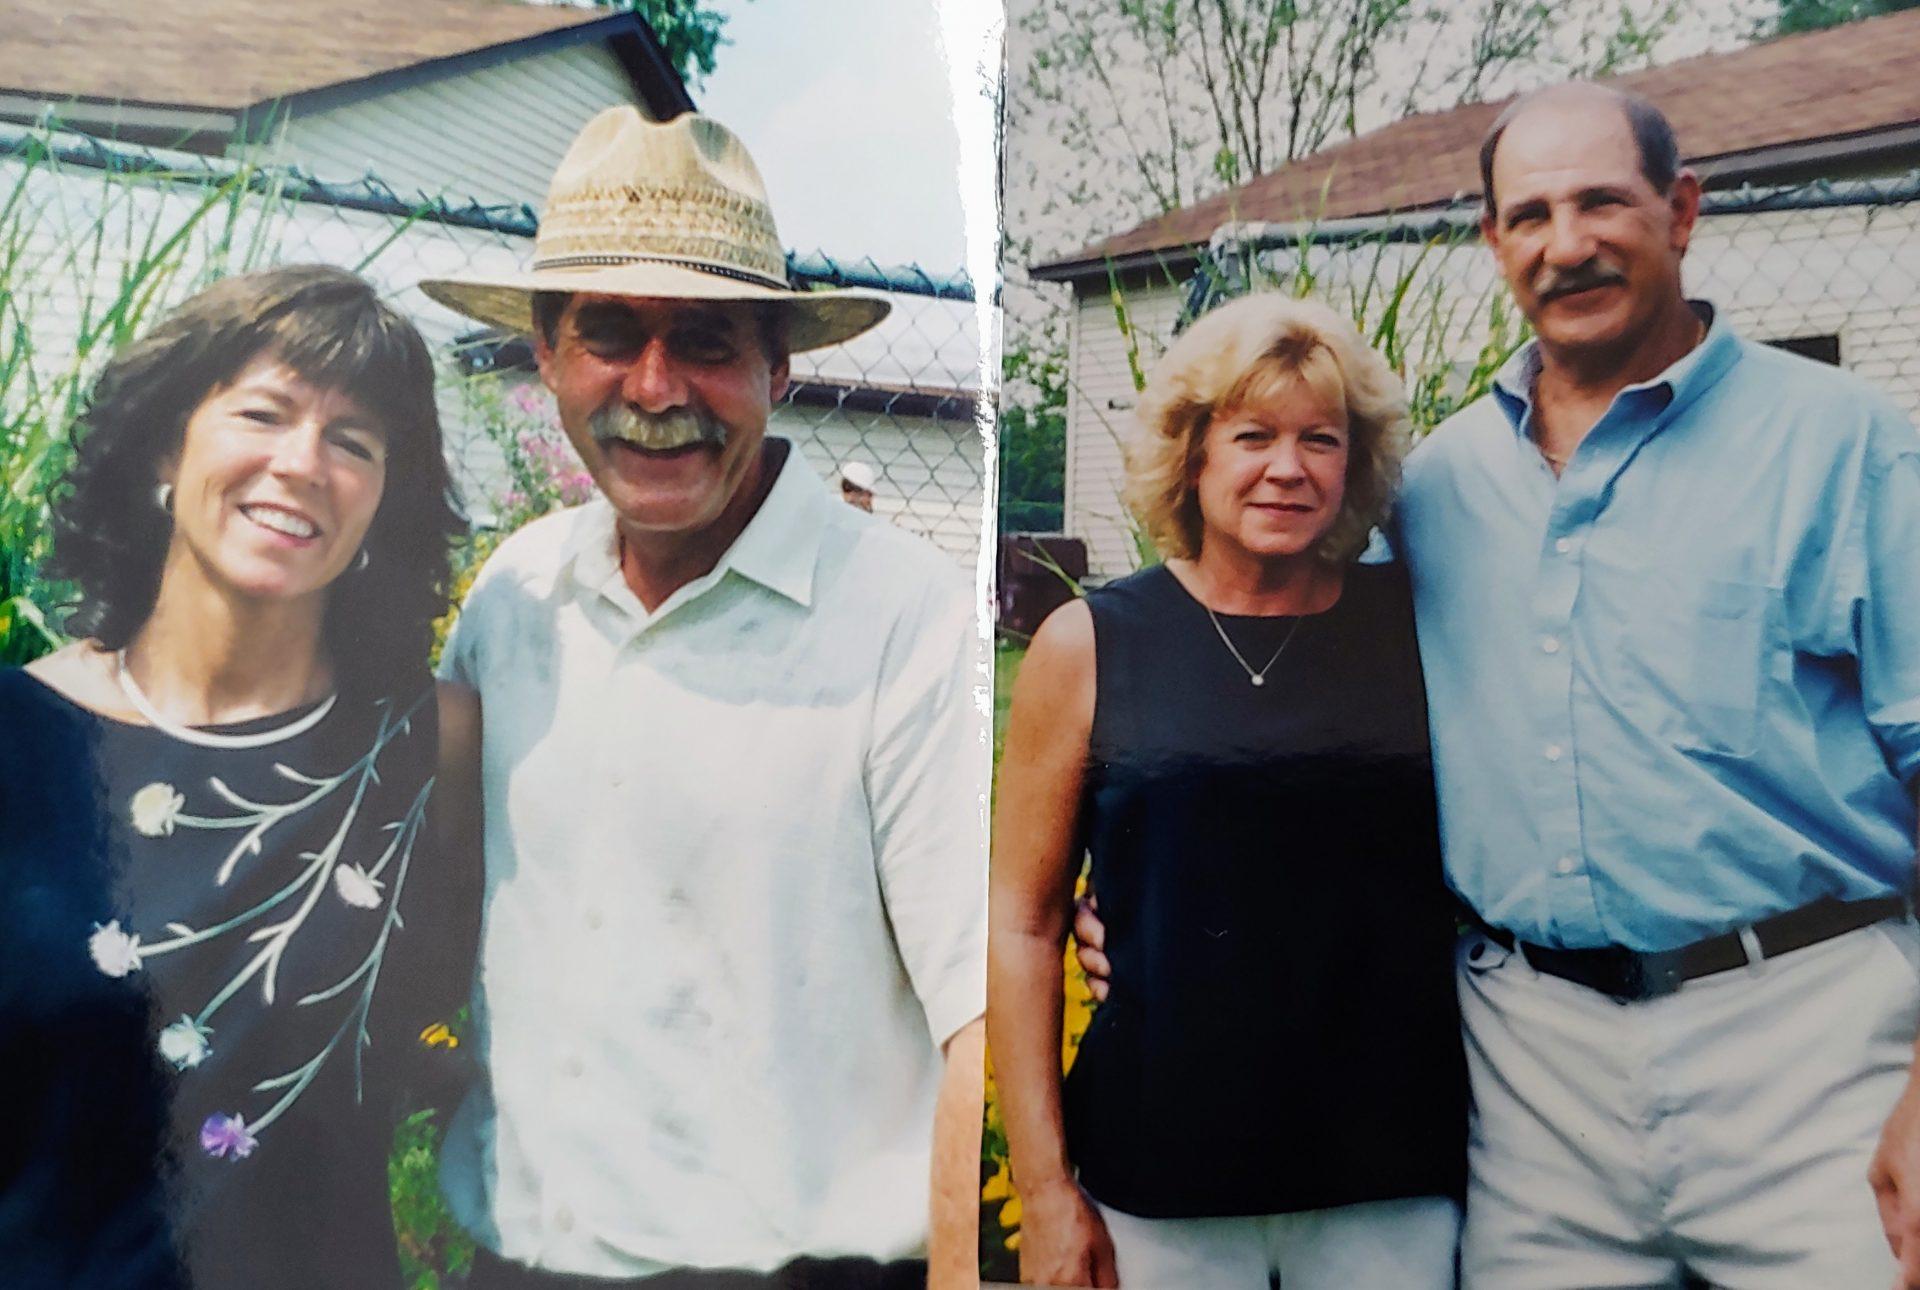 Dermot and Mary Solan.  Bob loved them dearly.  RIP. Too, Dermot